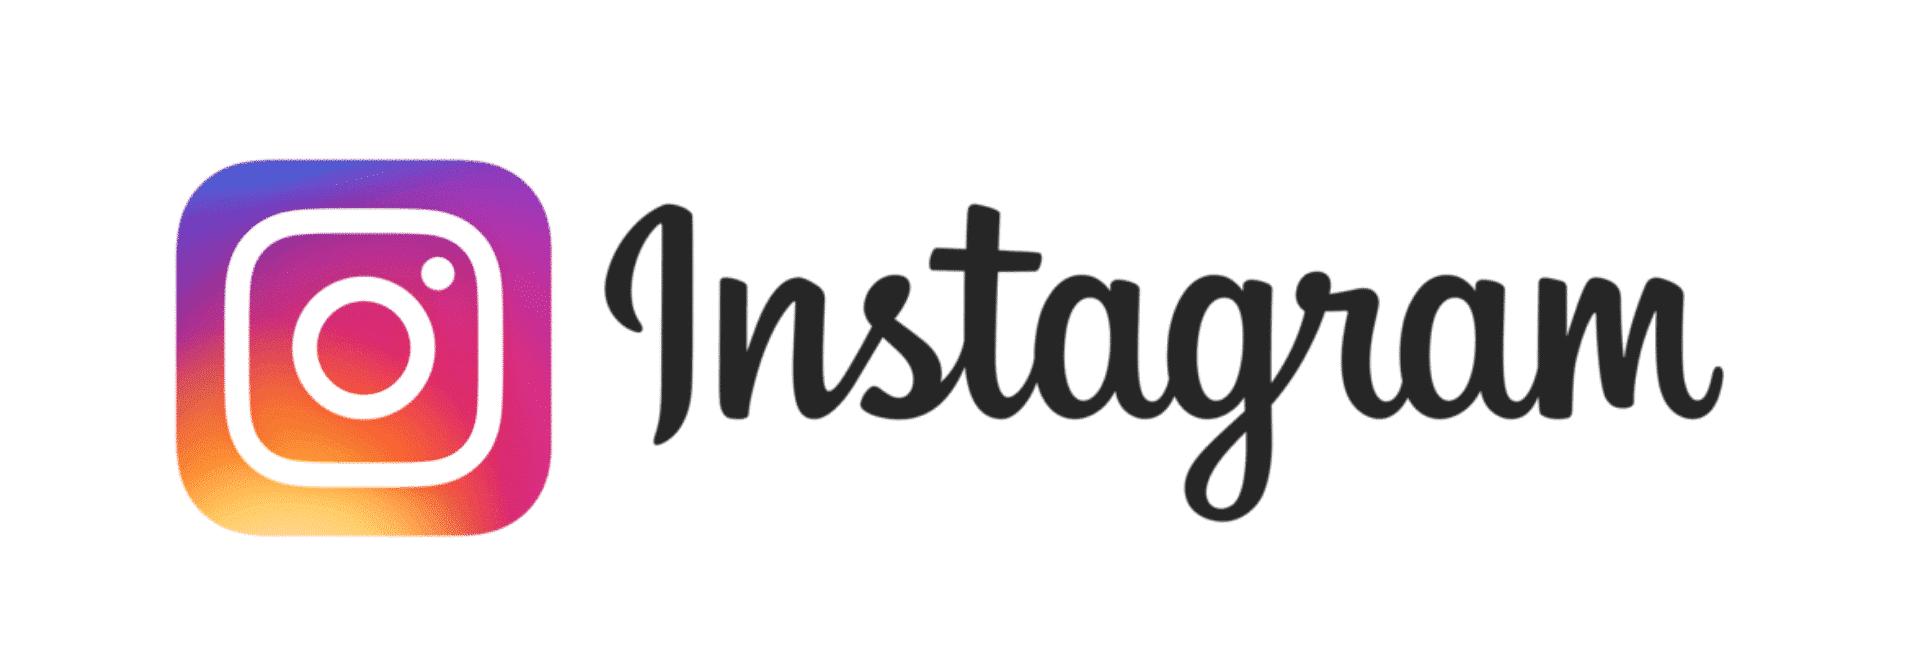 Instagram Logo | Best Facebook Alternatives in 2021